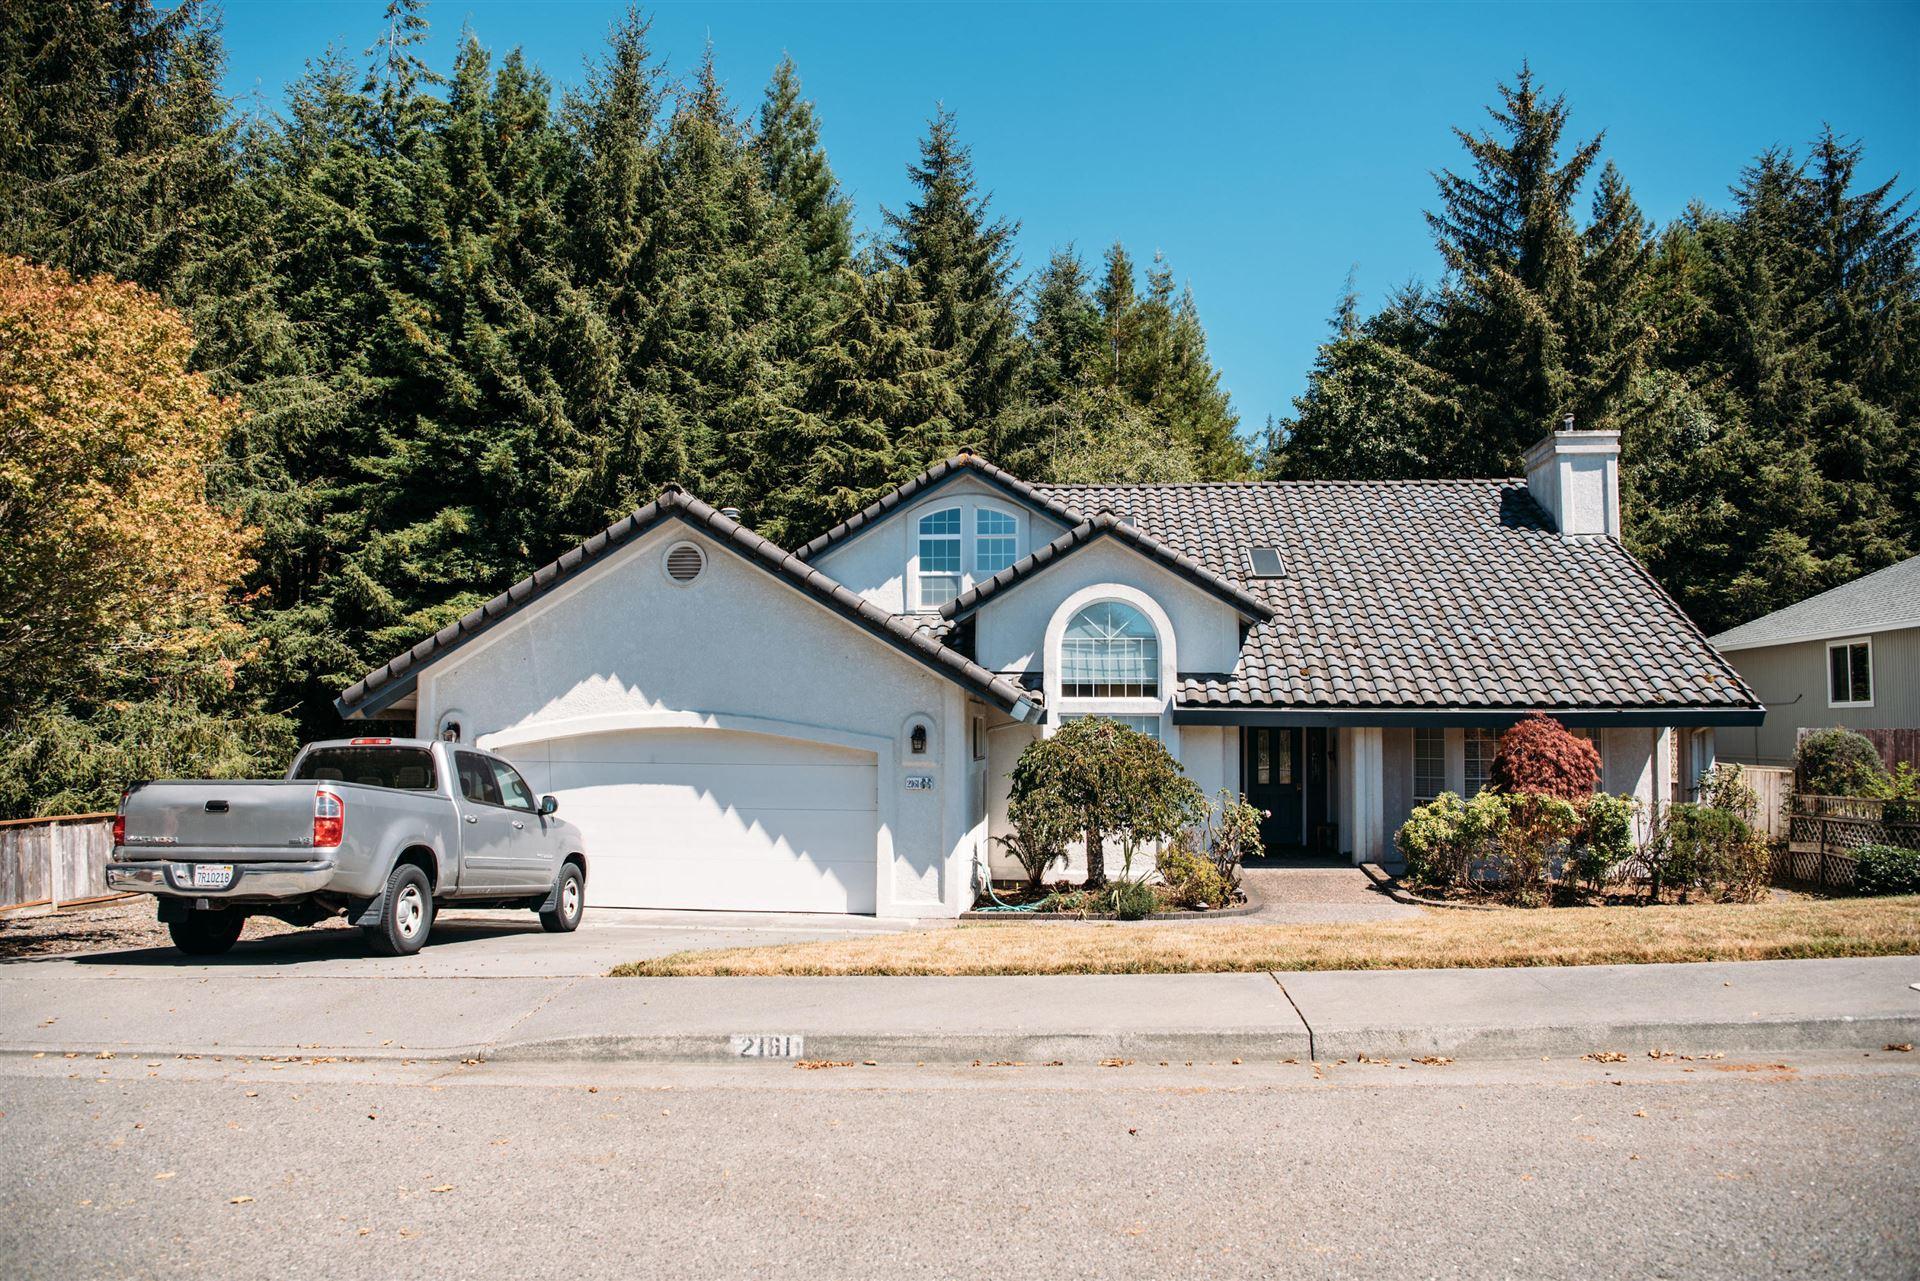 2161 Crystal Way, McKinleyville, CA 95519 - MLS#: 257228